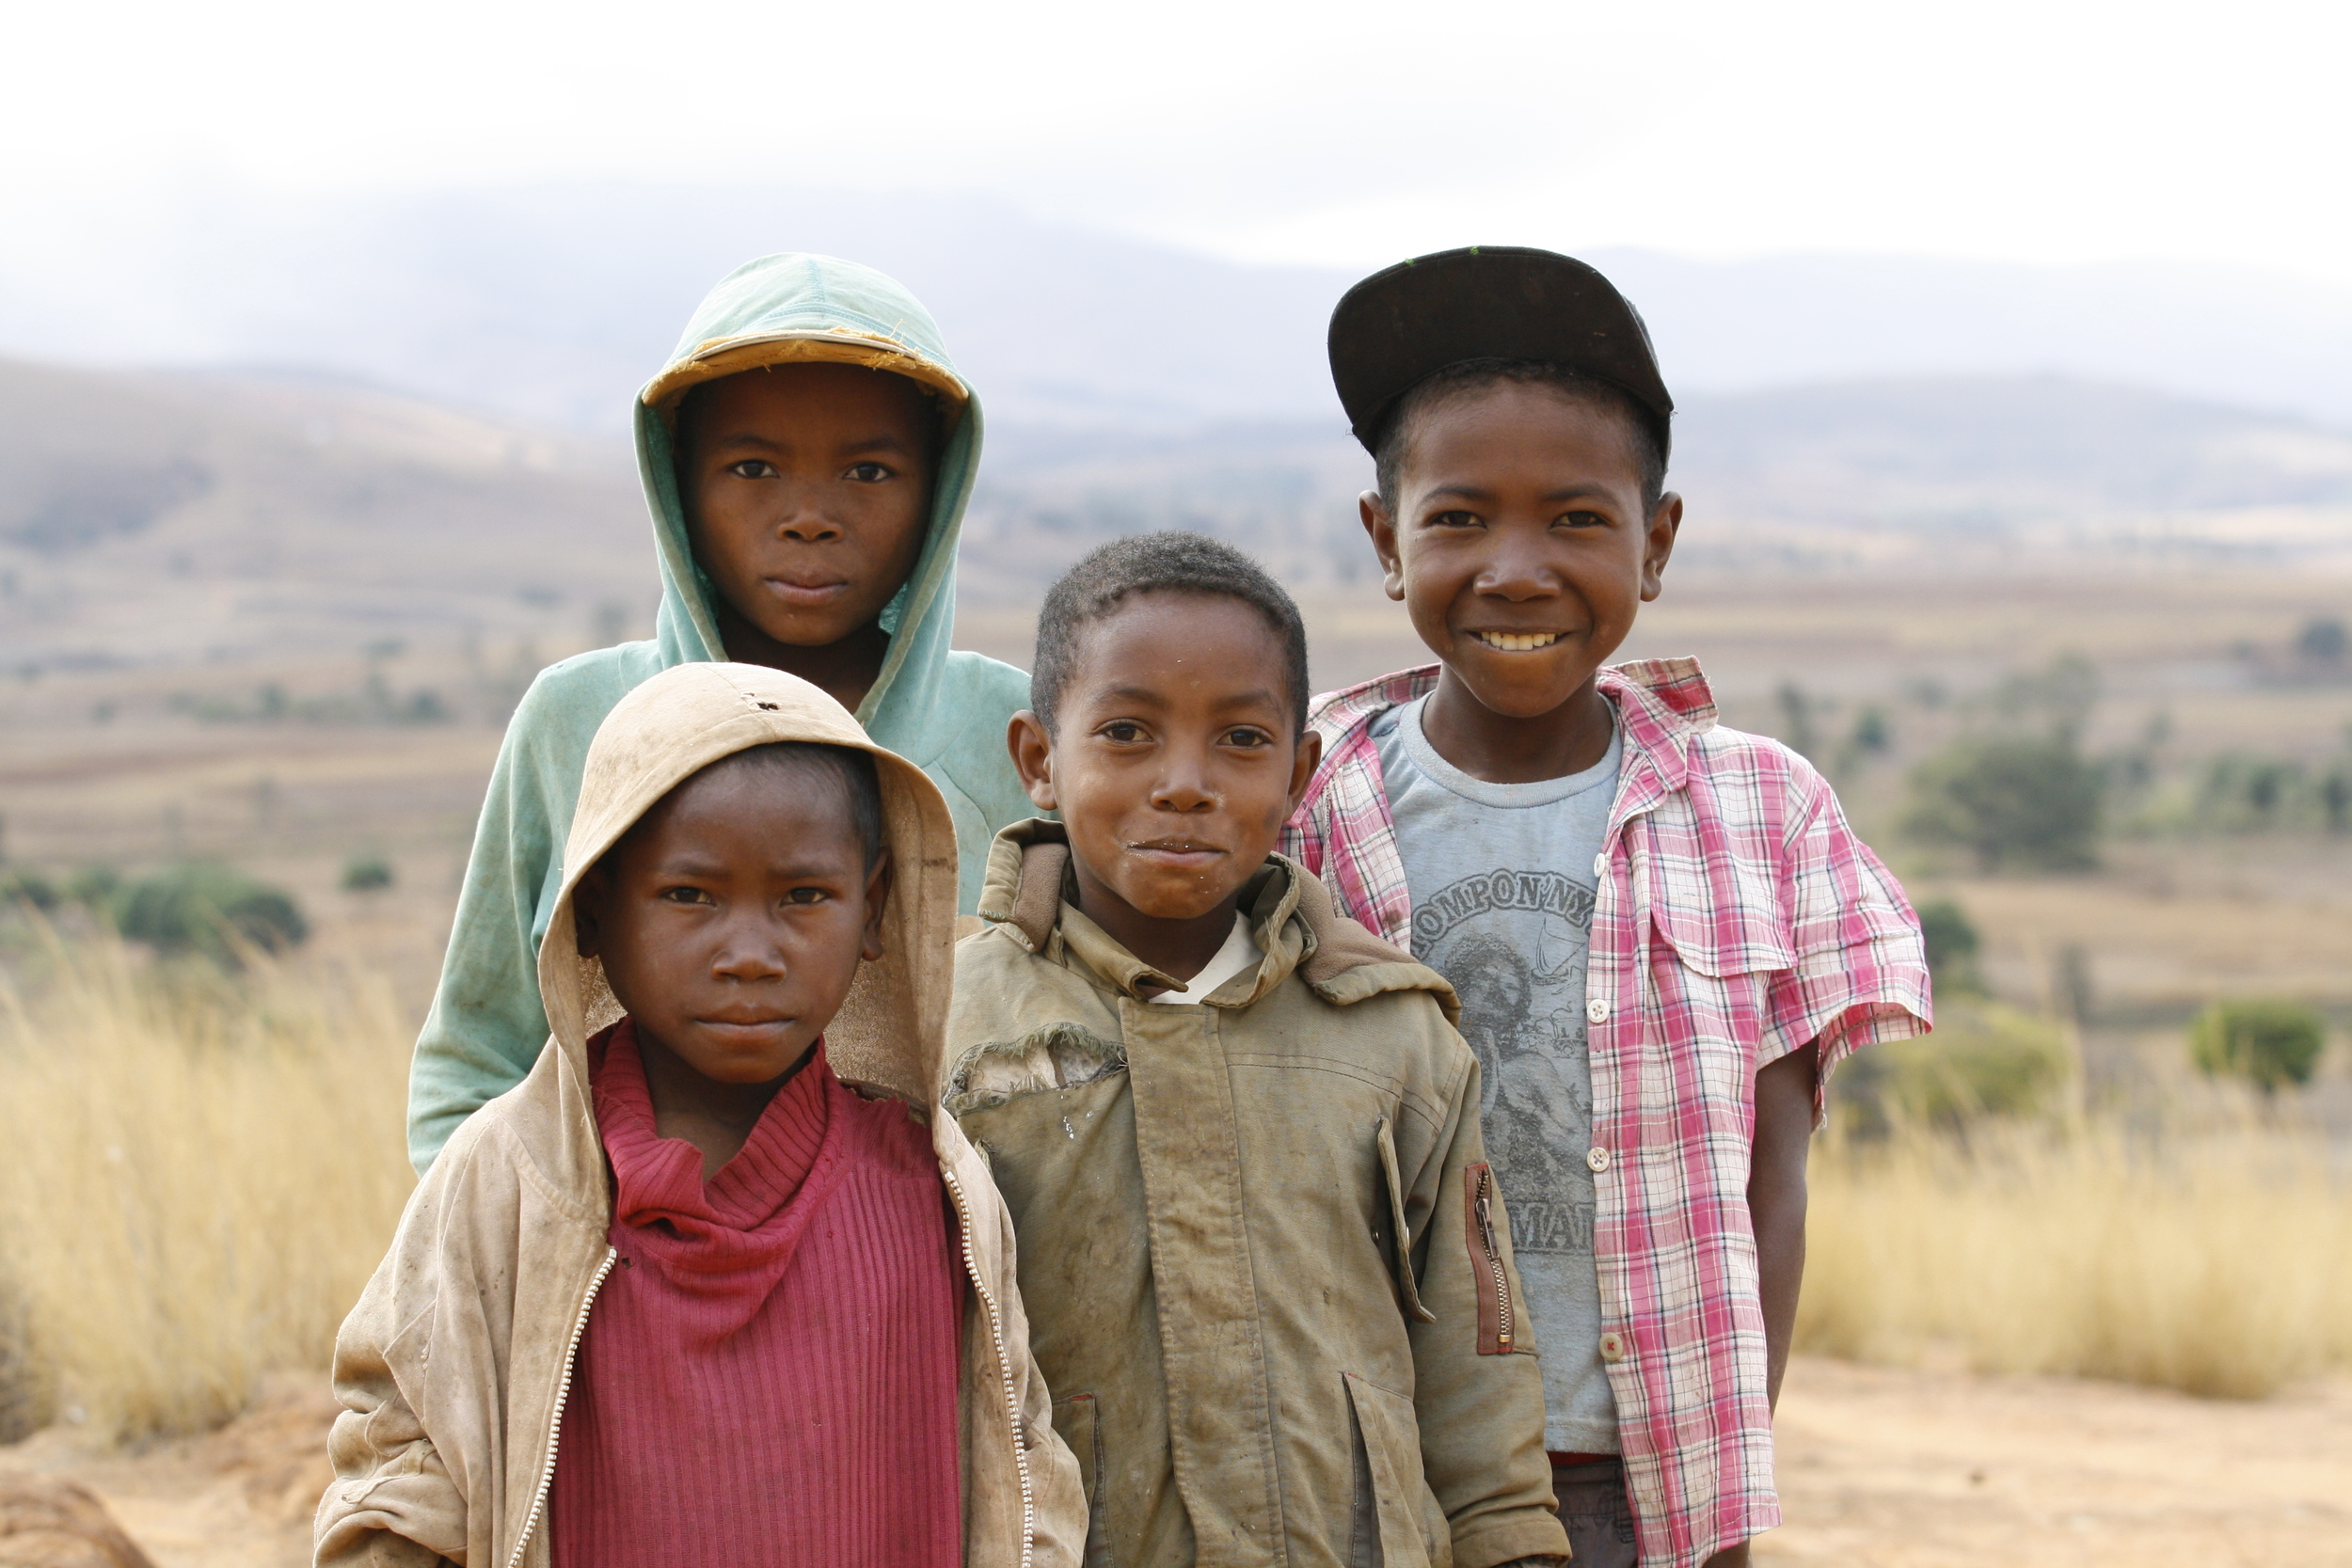 Malagasy children near Ambalavao, Madagascar